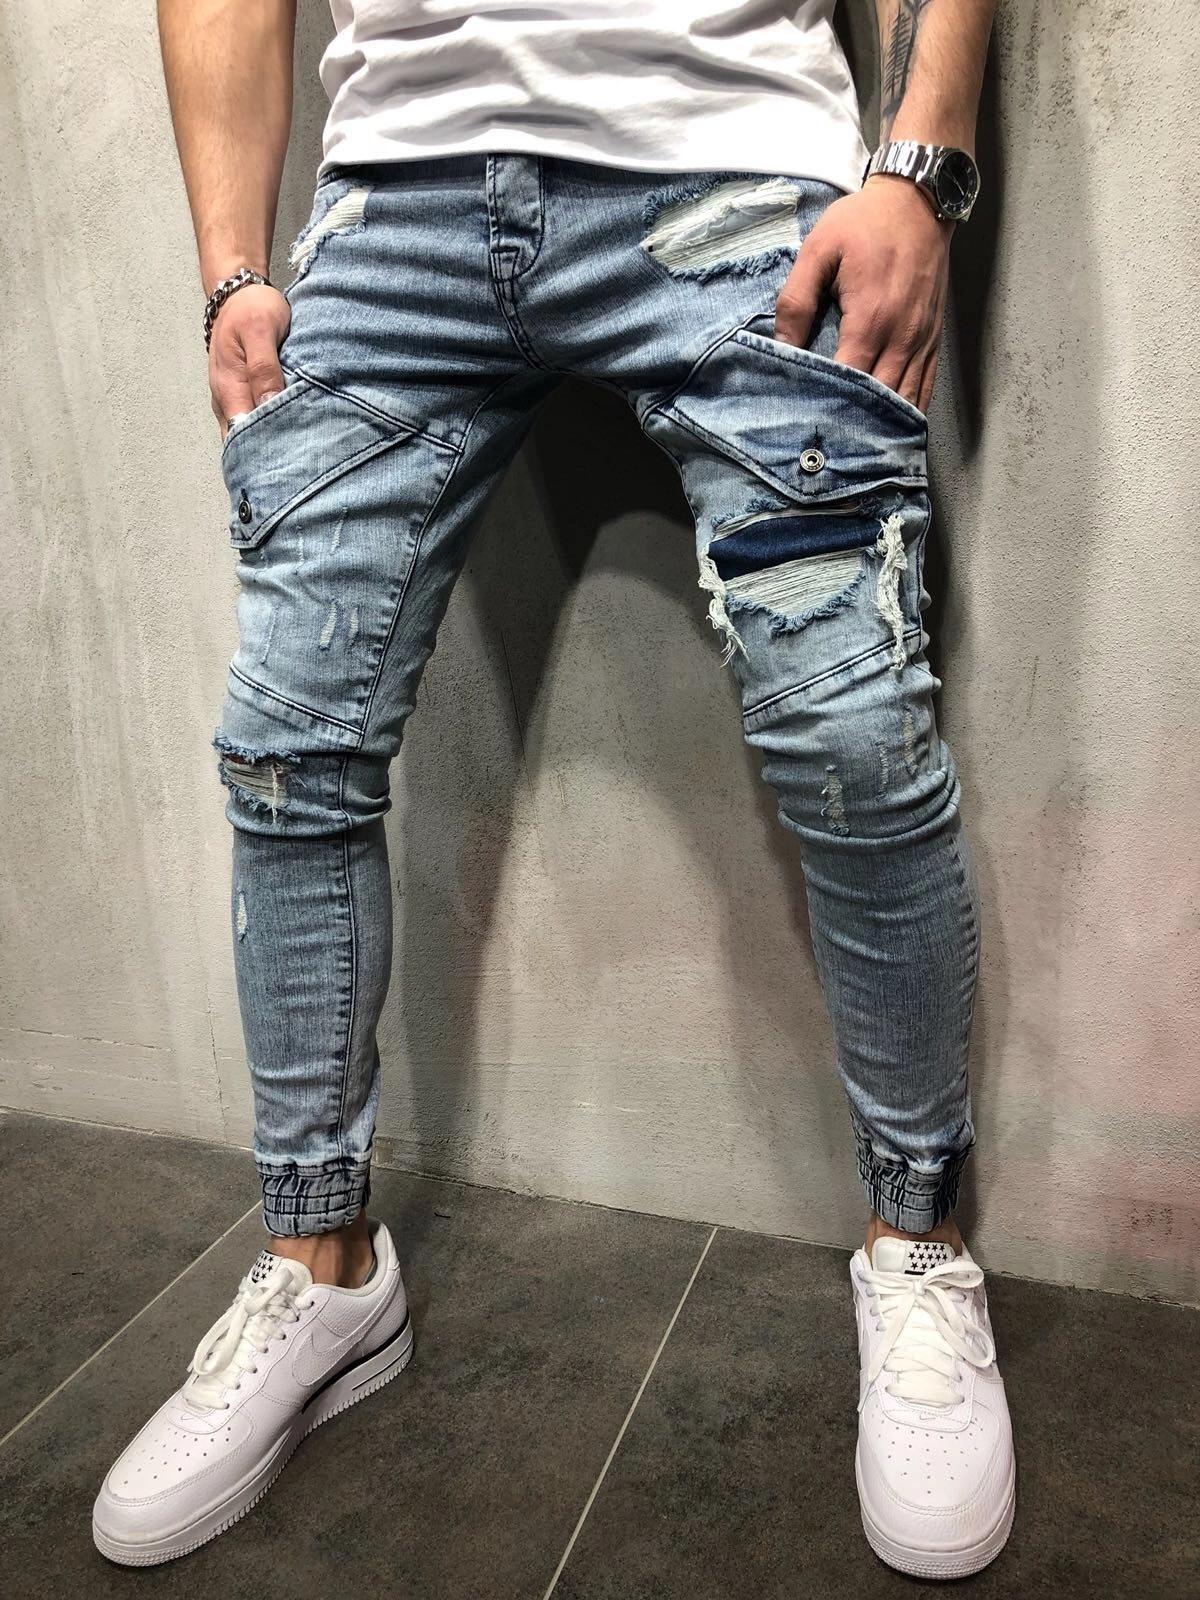 New Mens Jeans Washed Blue Knee Hole Zipper Pocket Design Hip Hop Pants Pencil Pants For Male